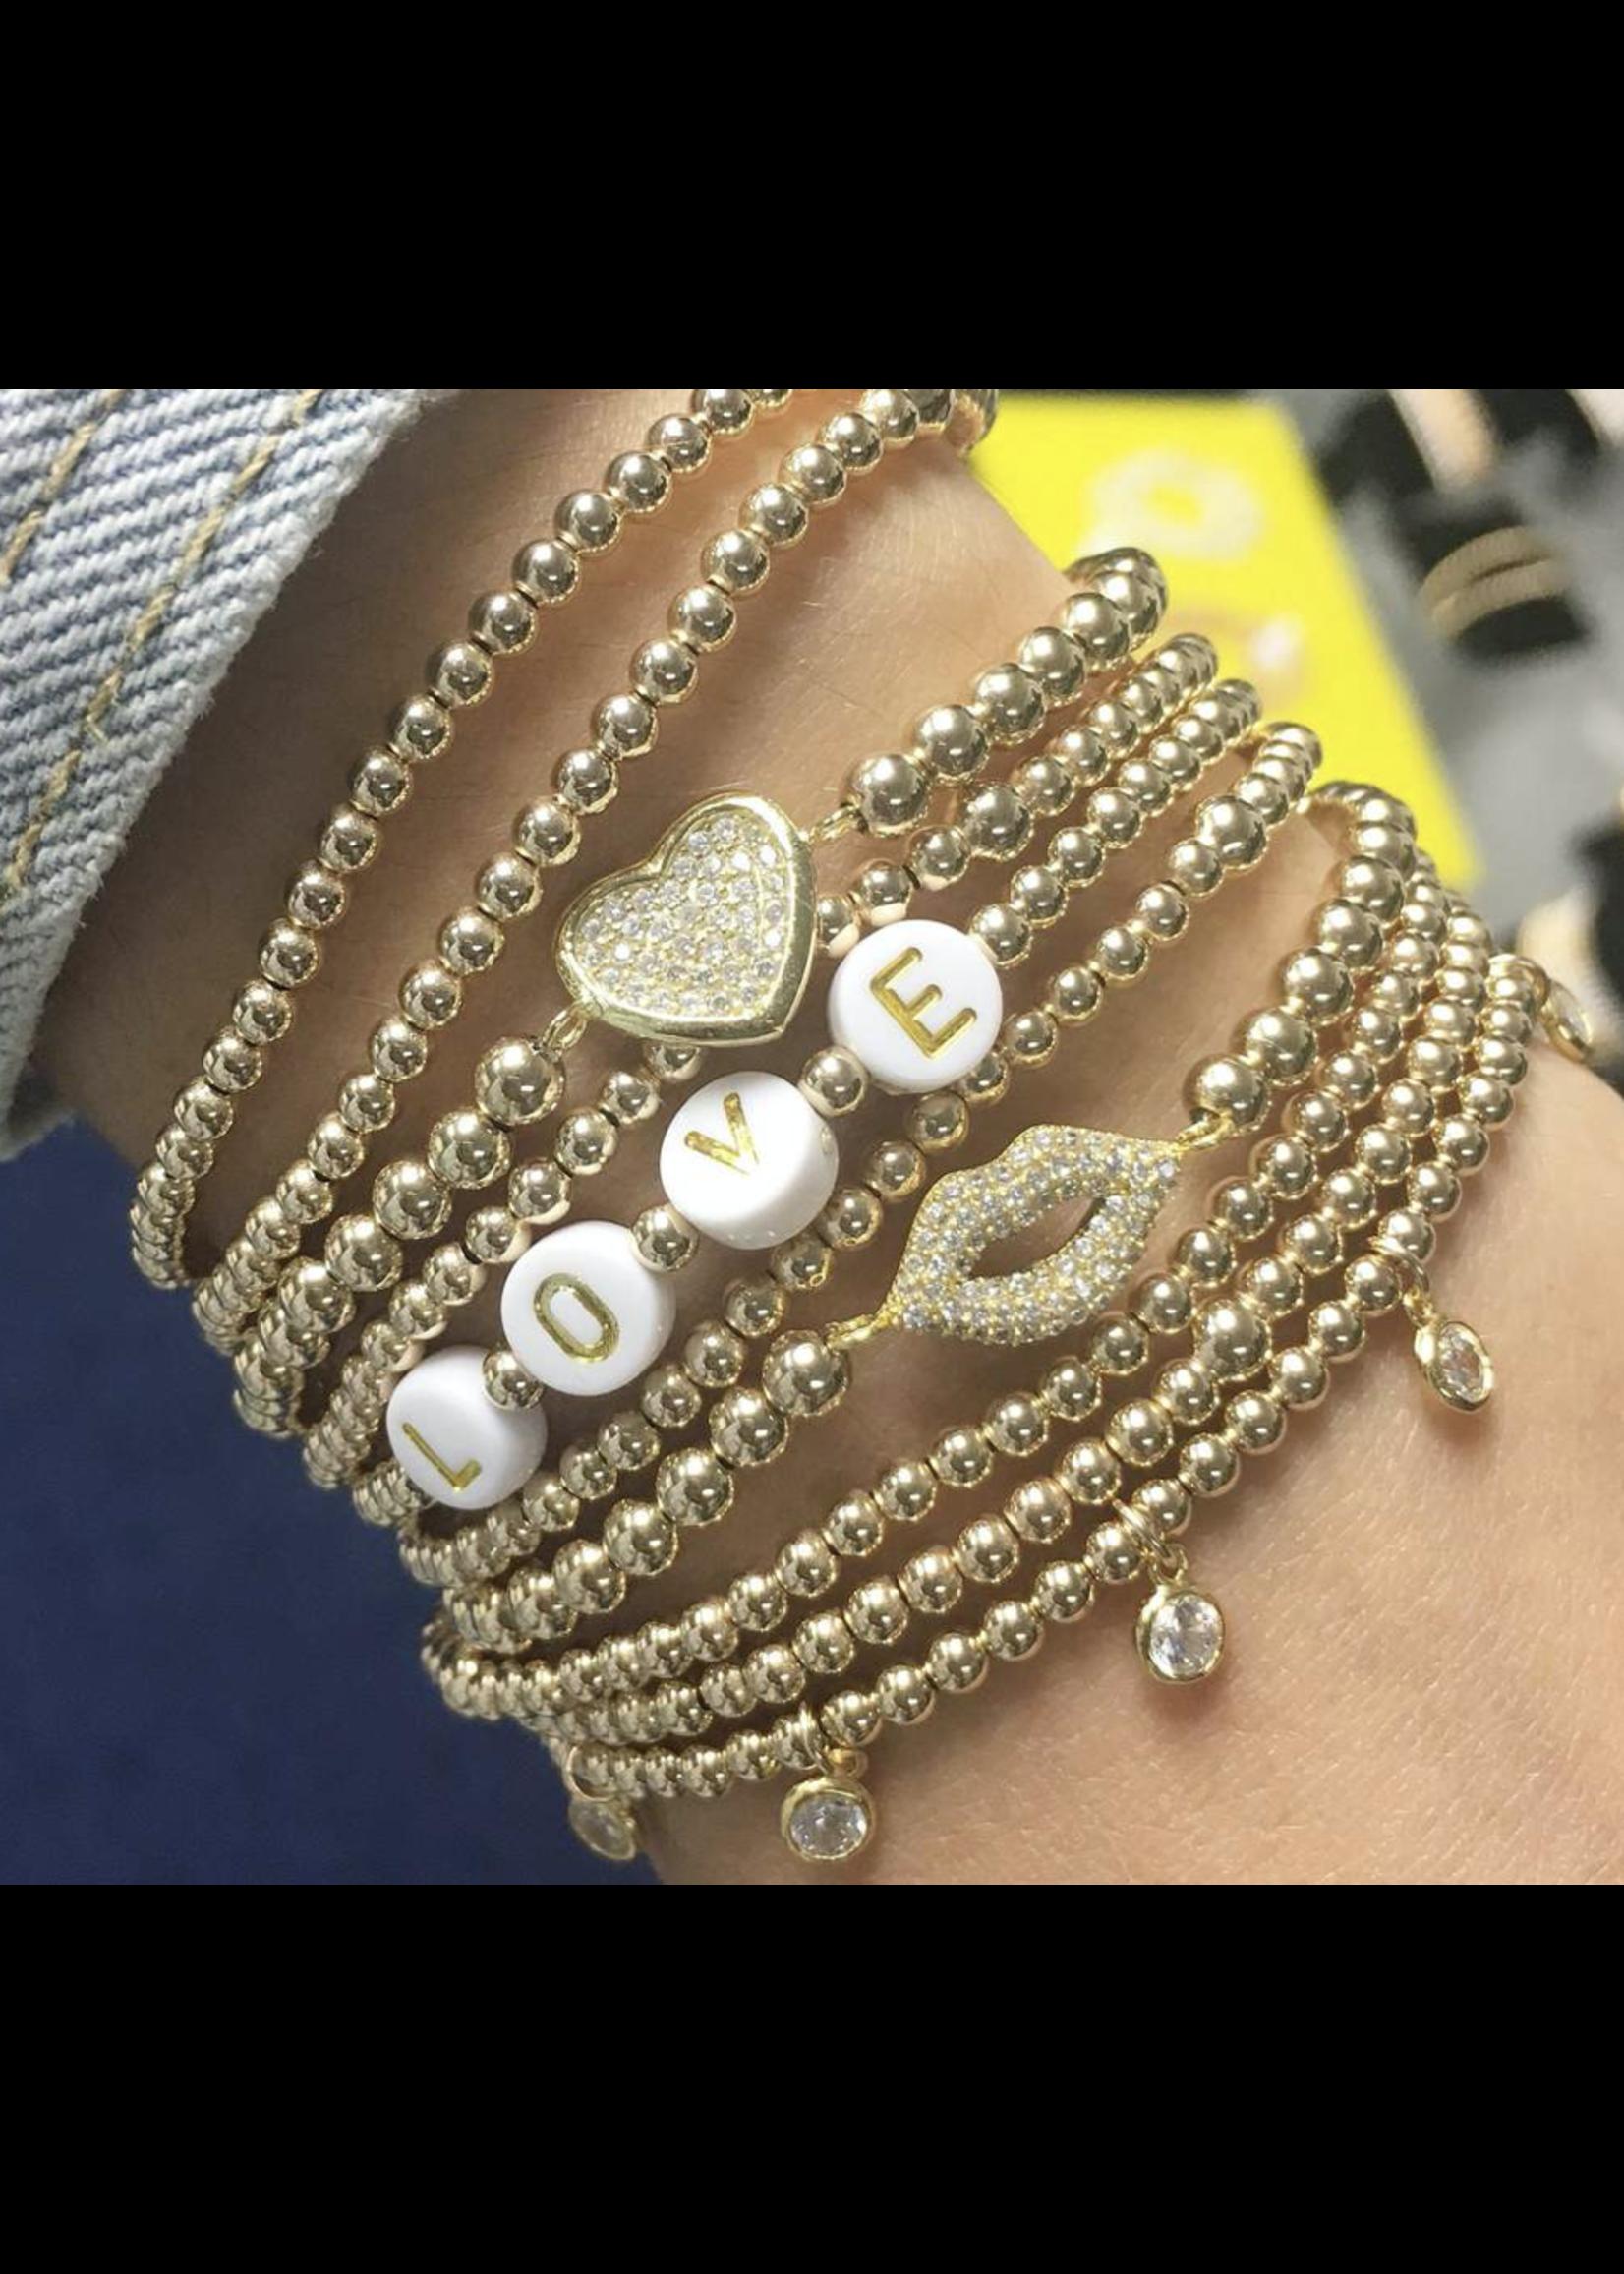 Jaimie Nicole Gold LOVE  Initial Bracelet